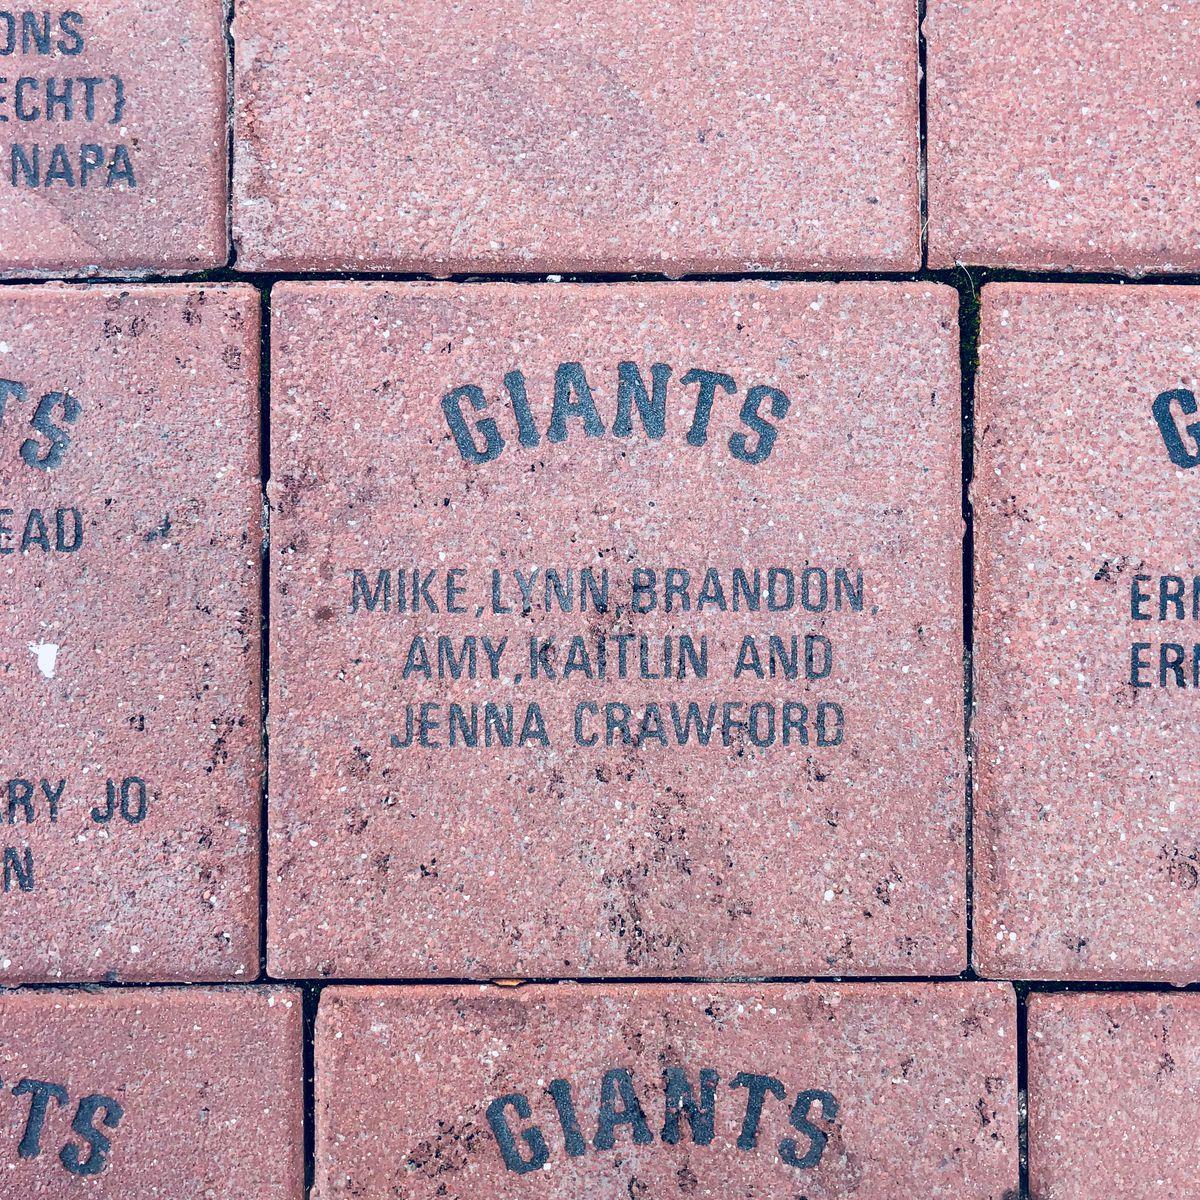 A commemorative brick at Oracle Park.